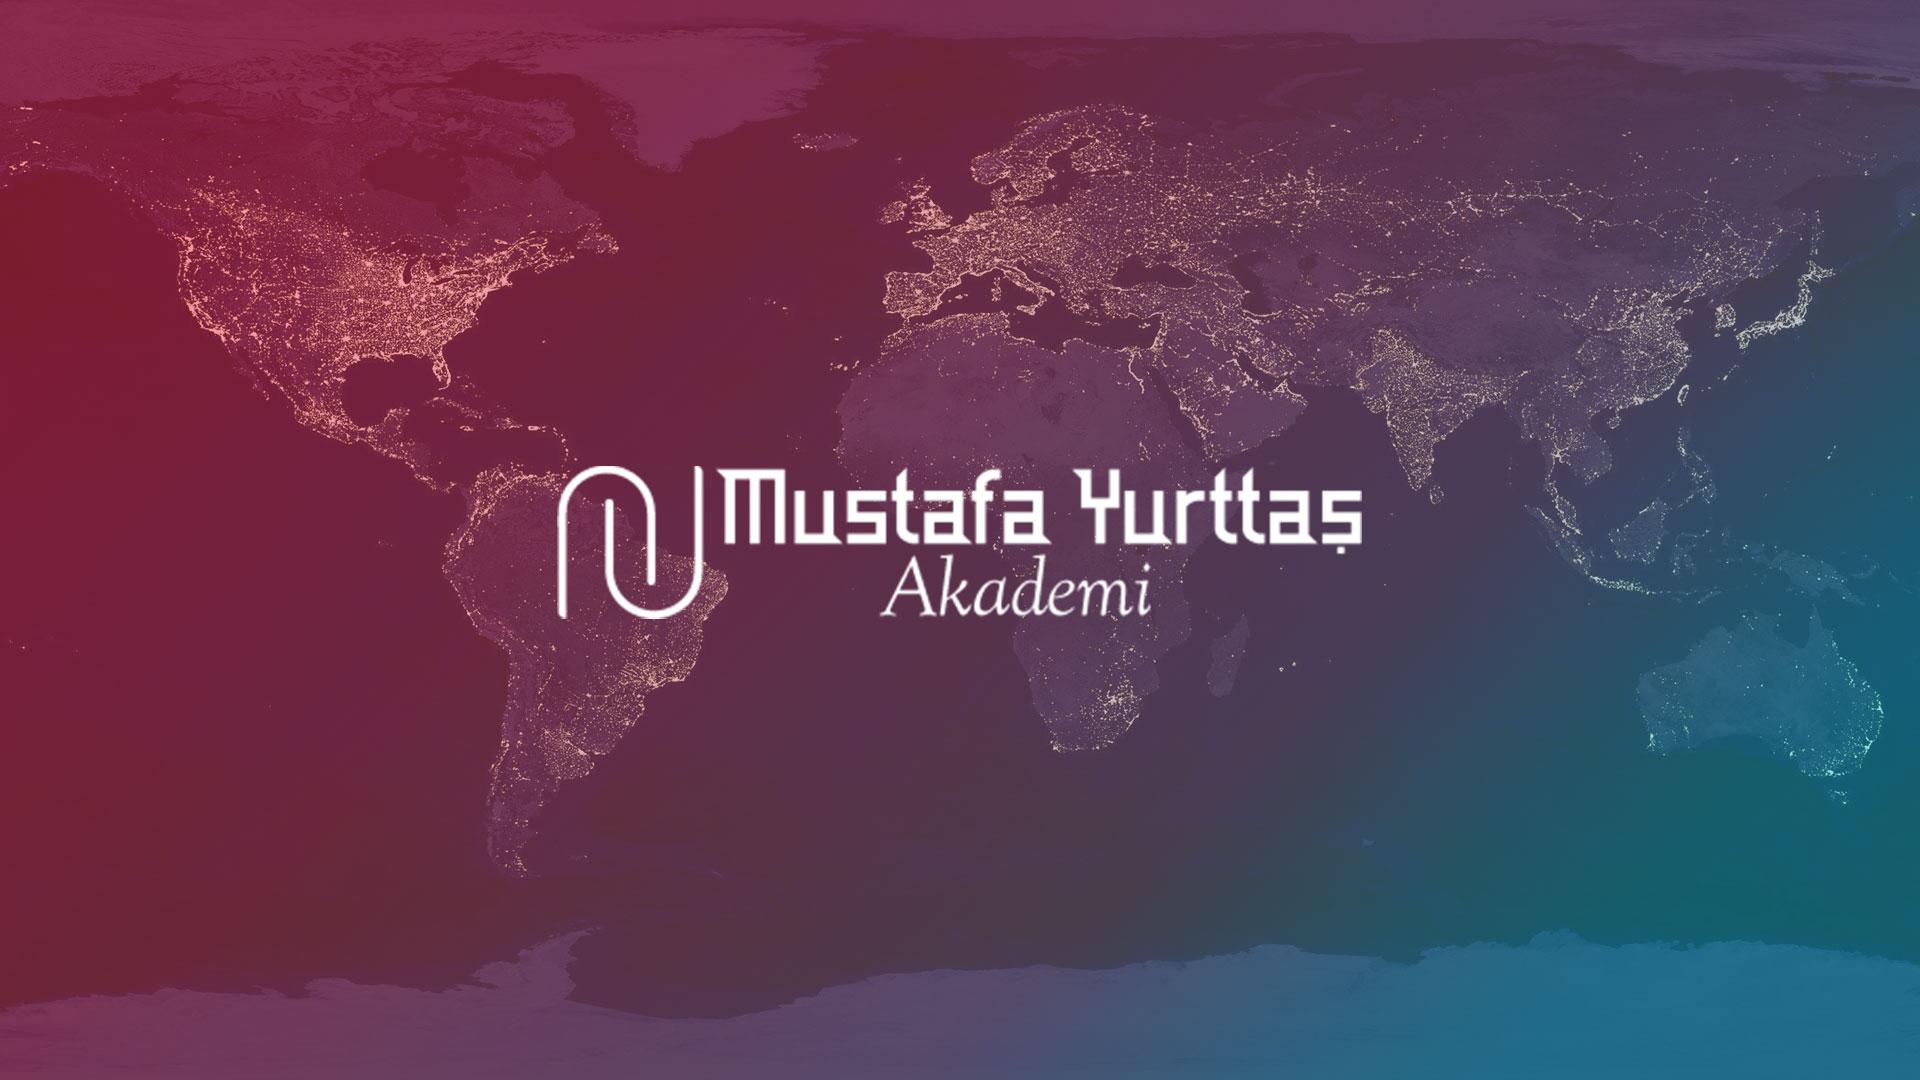 Mustafa Yurttaş Akademi